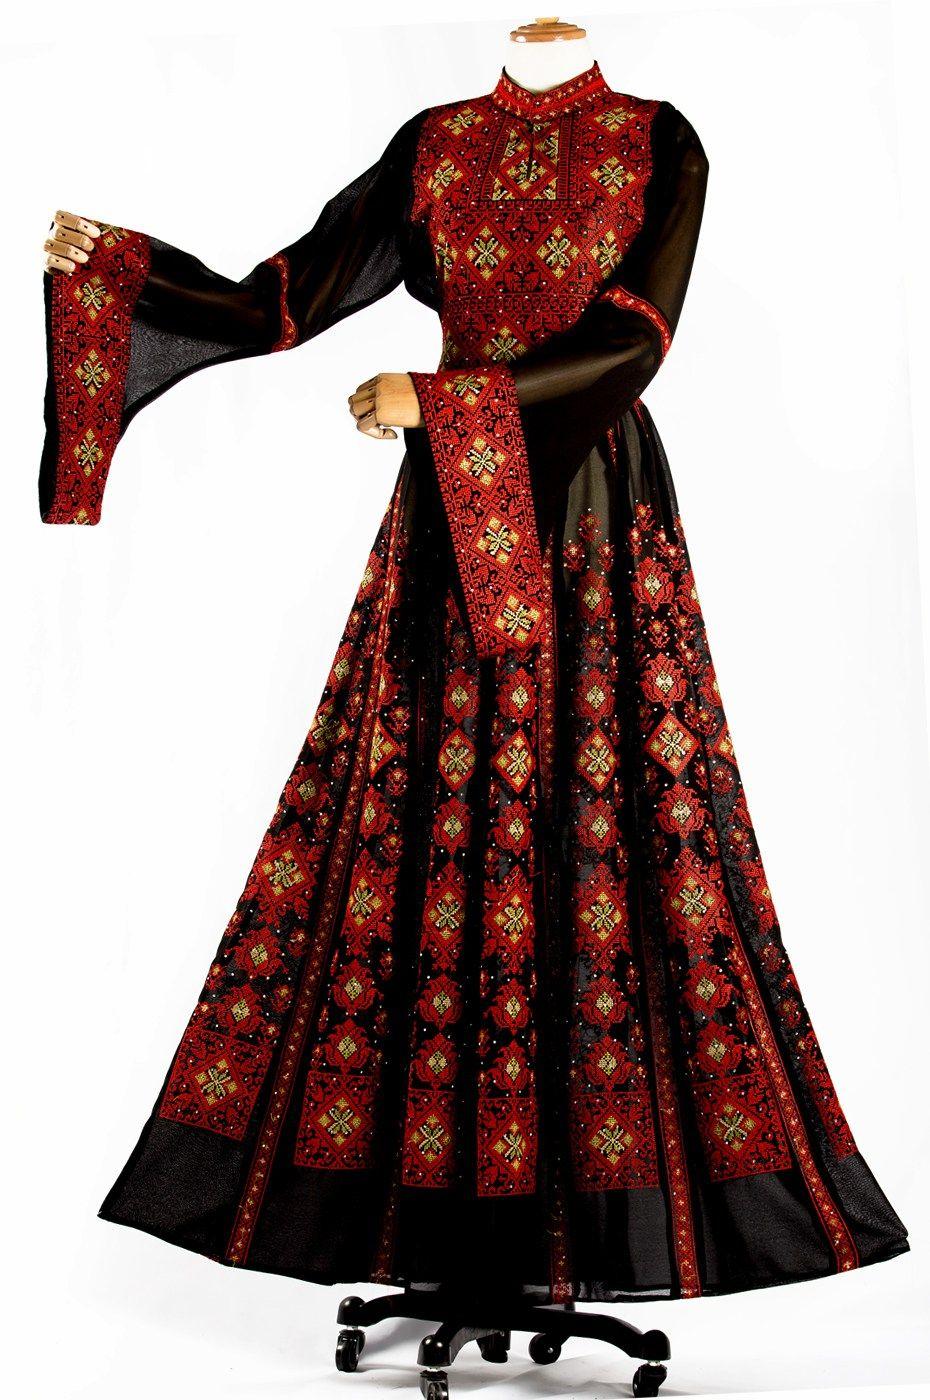 جلابية شرحات دبل كلوش نترات السندس Long Sleeve Dress Fashion Dresses